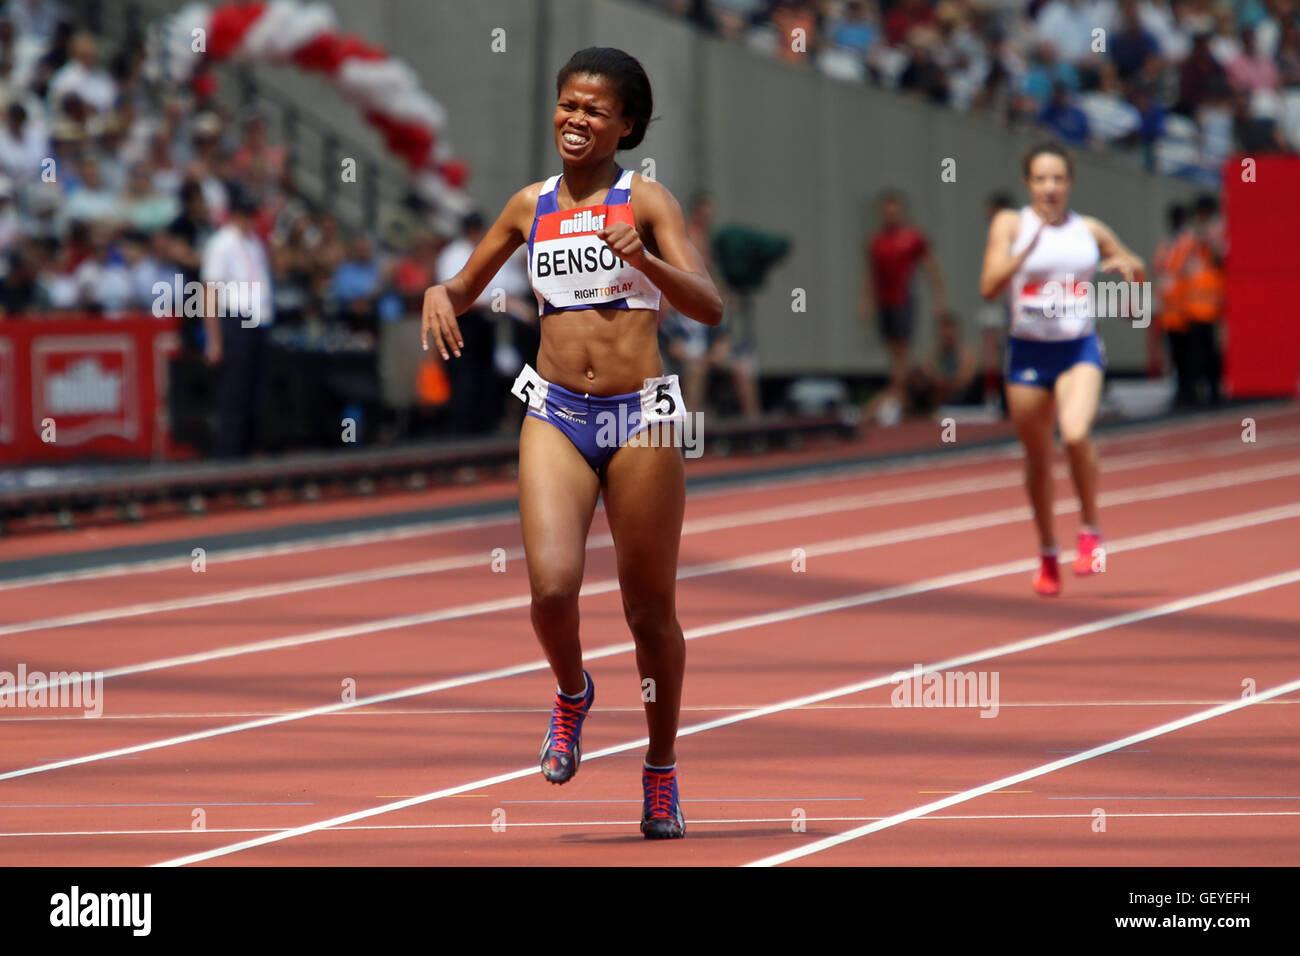 Johanna benson of namibia winning the 400 metres women t37 2016